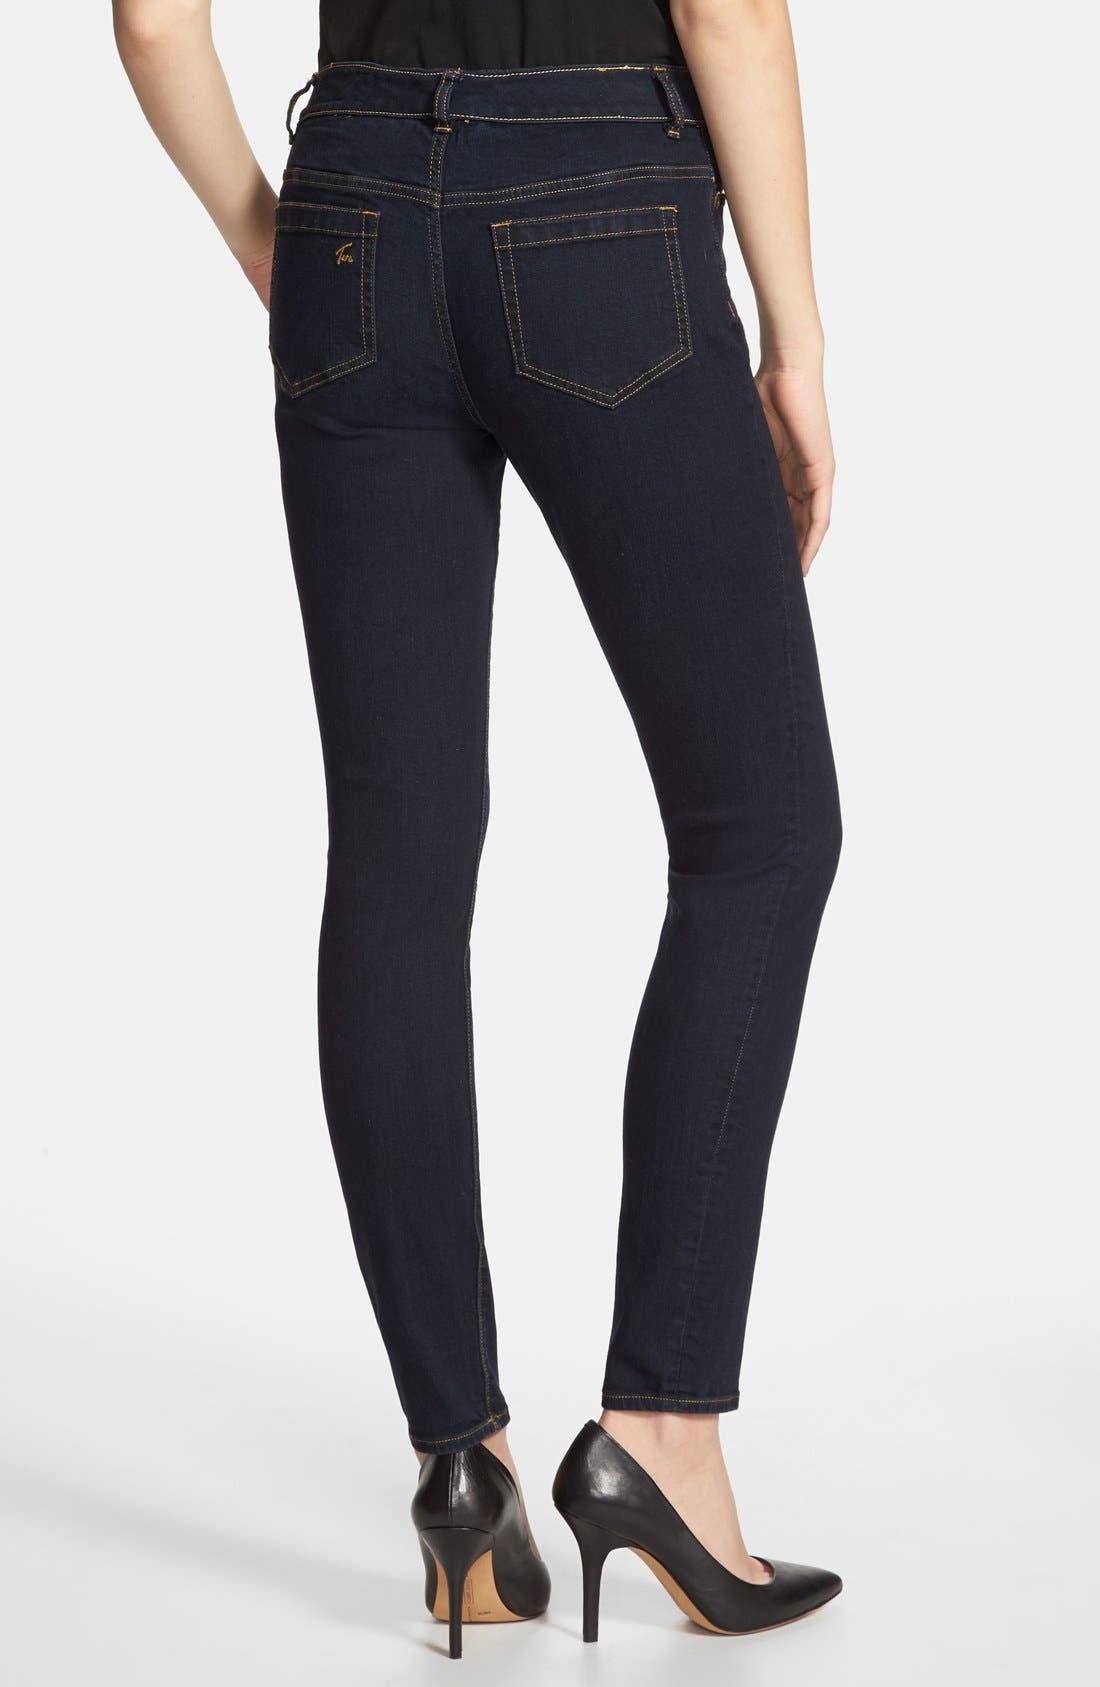 Alternate Image 2  - Vince Camuto Super Stretch Skinny Jeans (Midnight Dark)